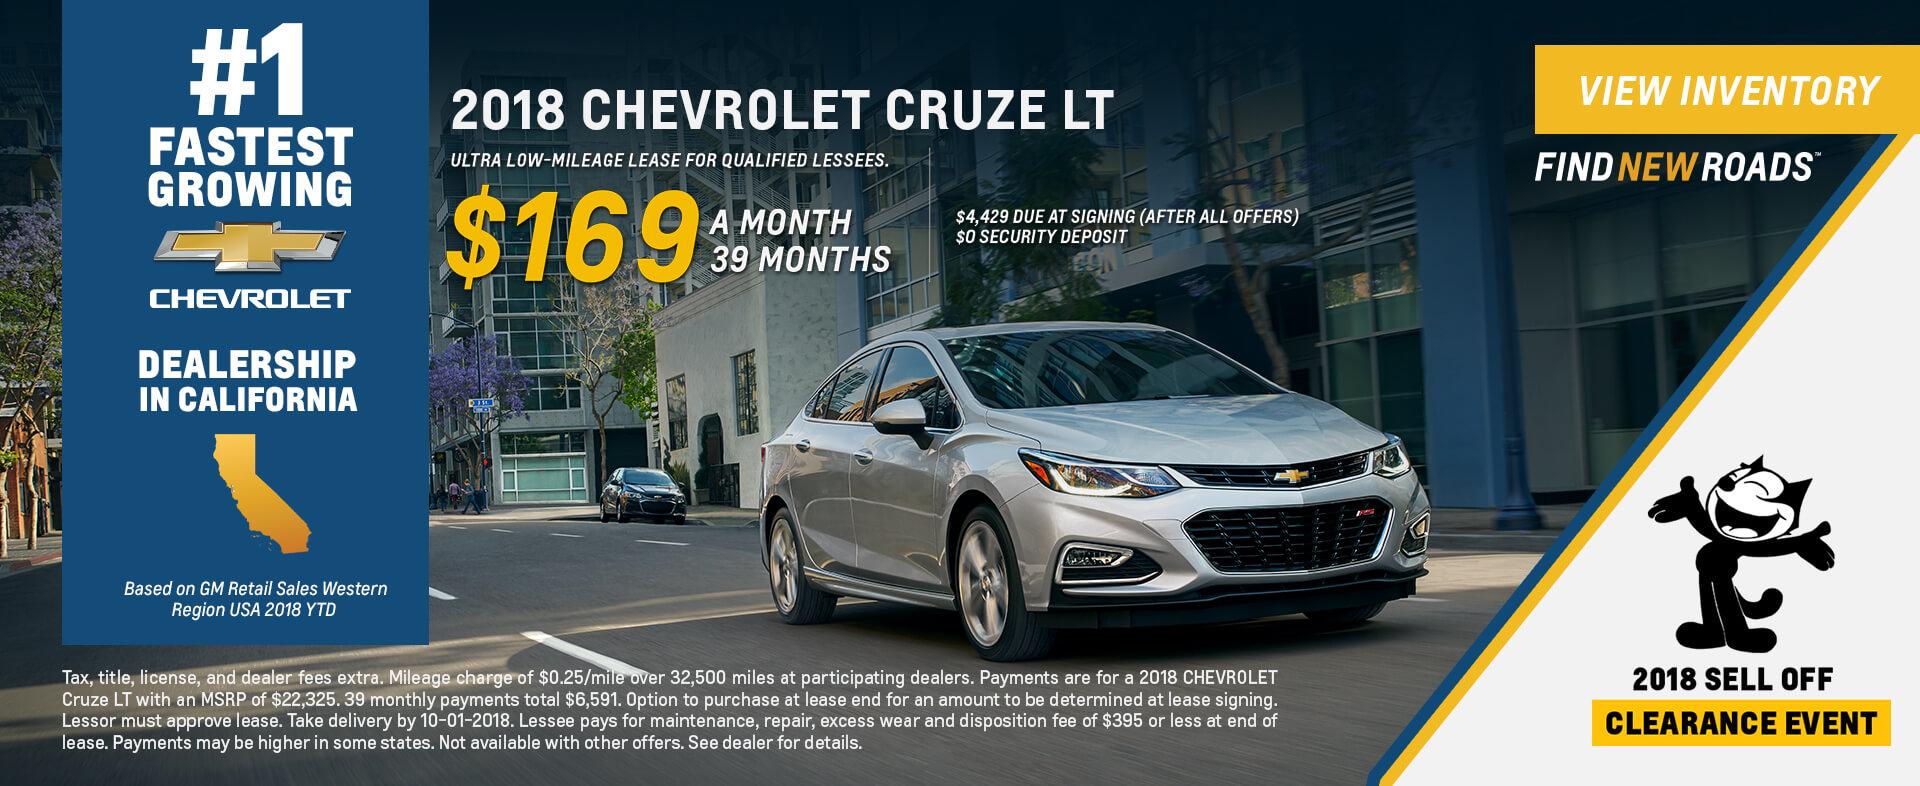 Chevrolet Cruze $169 Lease